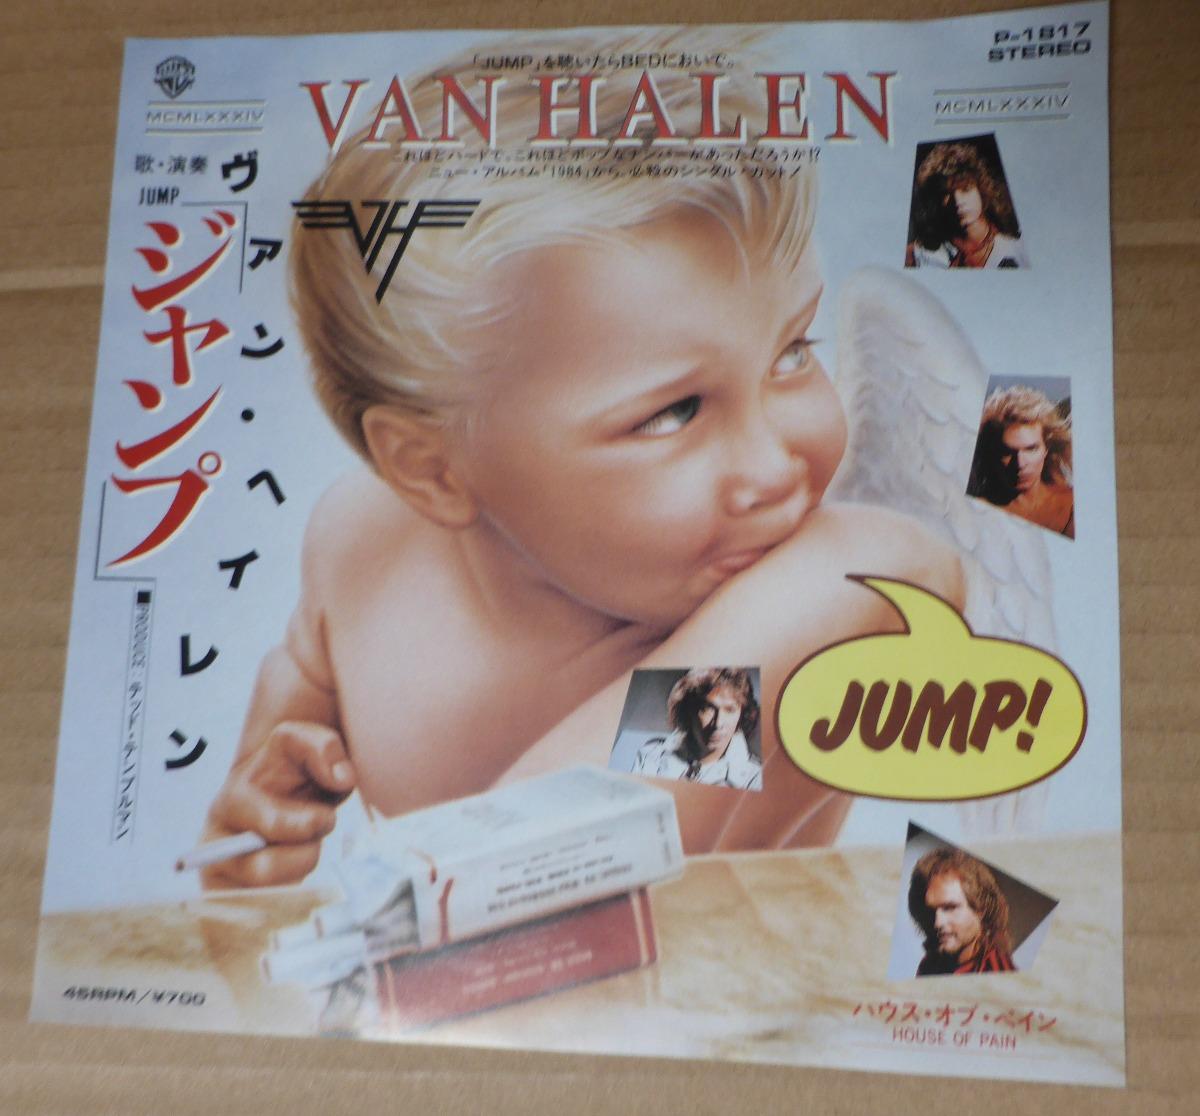 Van Halen Jump House Of Pain 45 Popsike S 45 00 En Mercado Libre